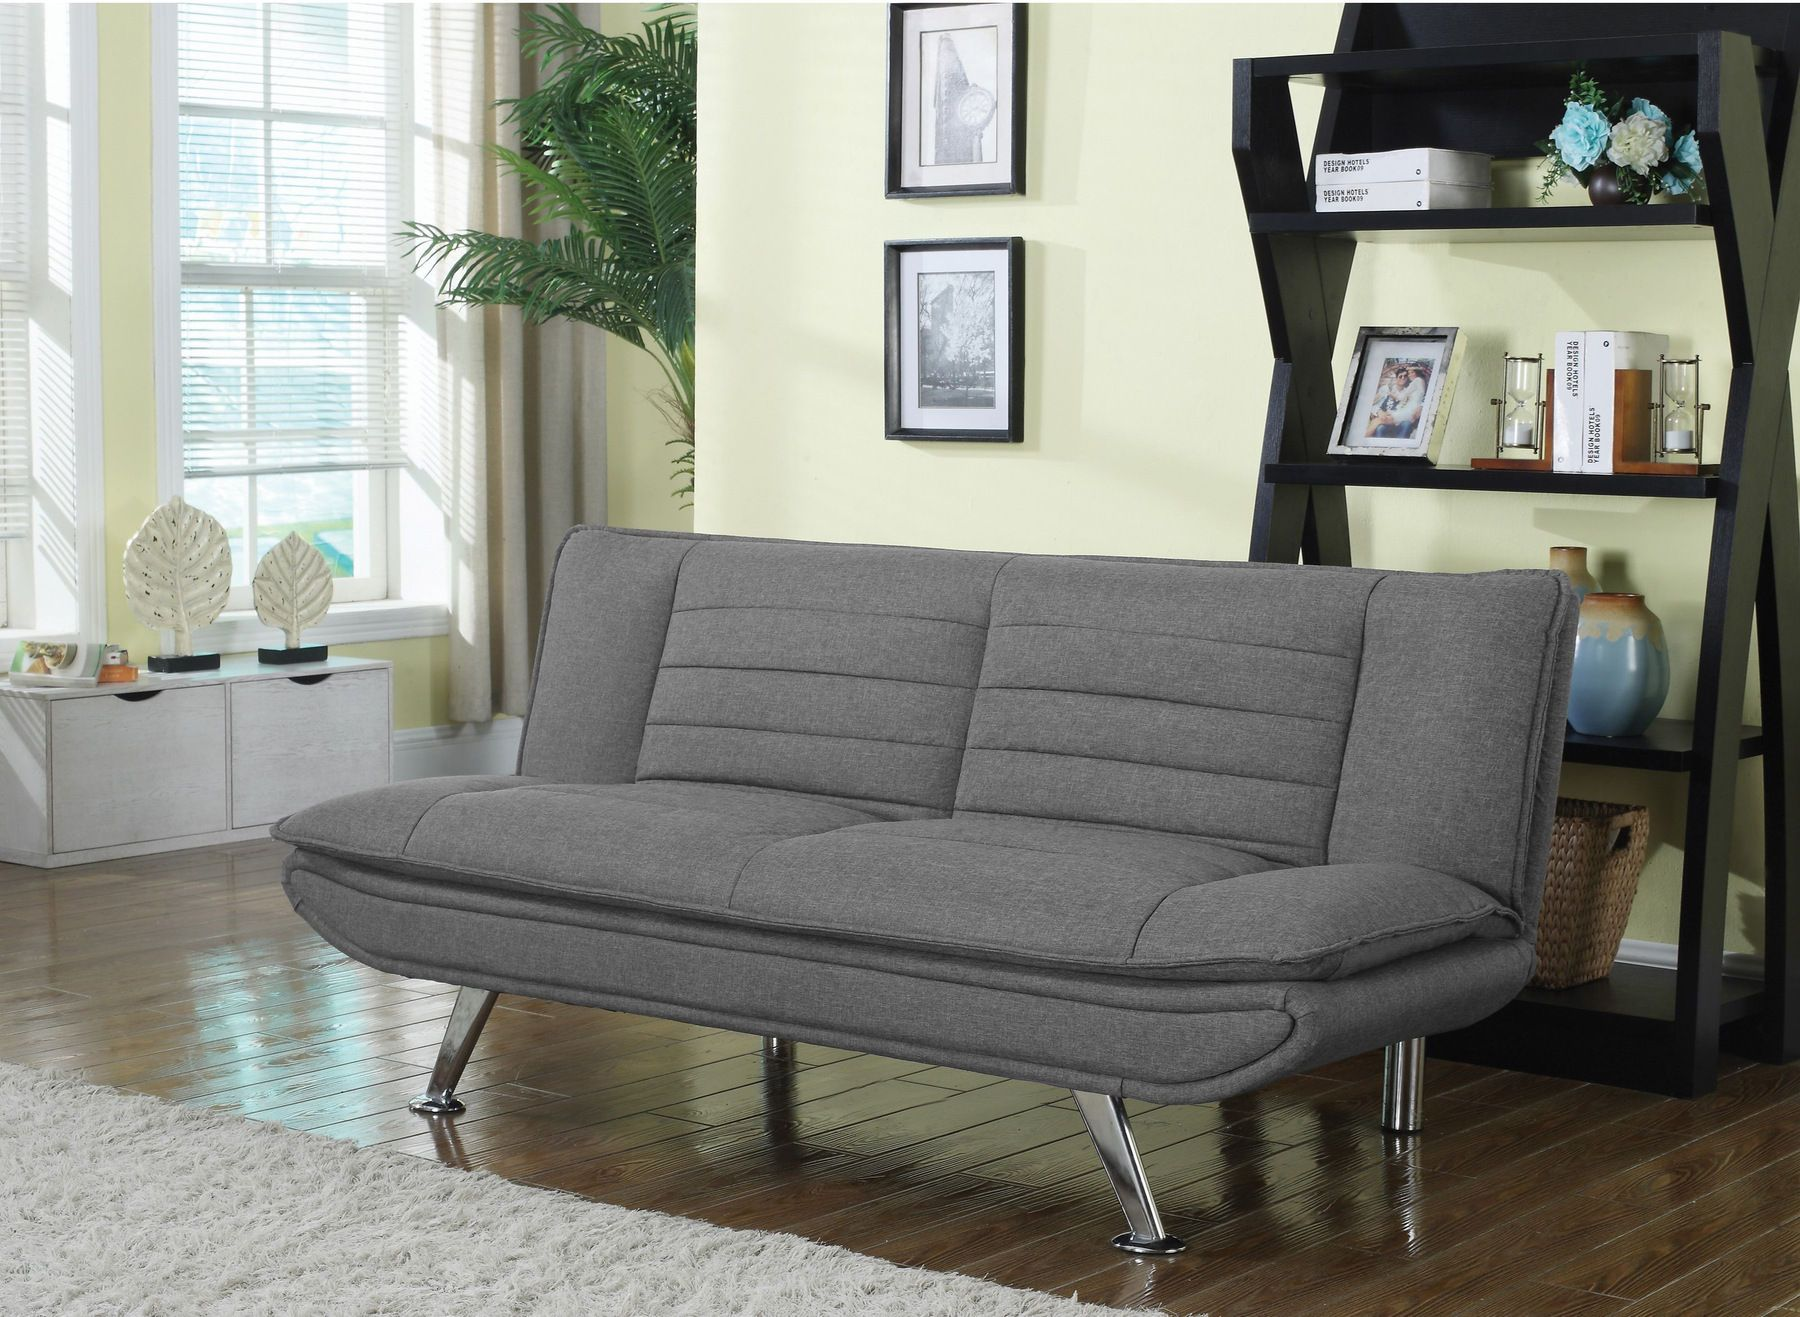 Coaster Cs966 Gray Woven Fabric Sofa Bed Grey Sofa Bed Living Room Sofa Futon Sofa